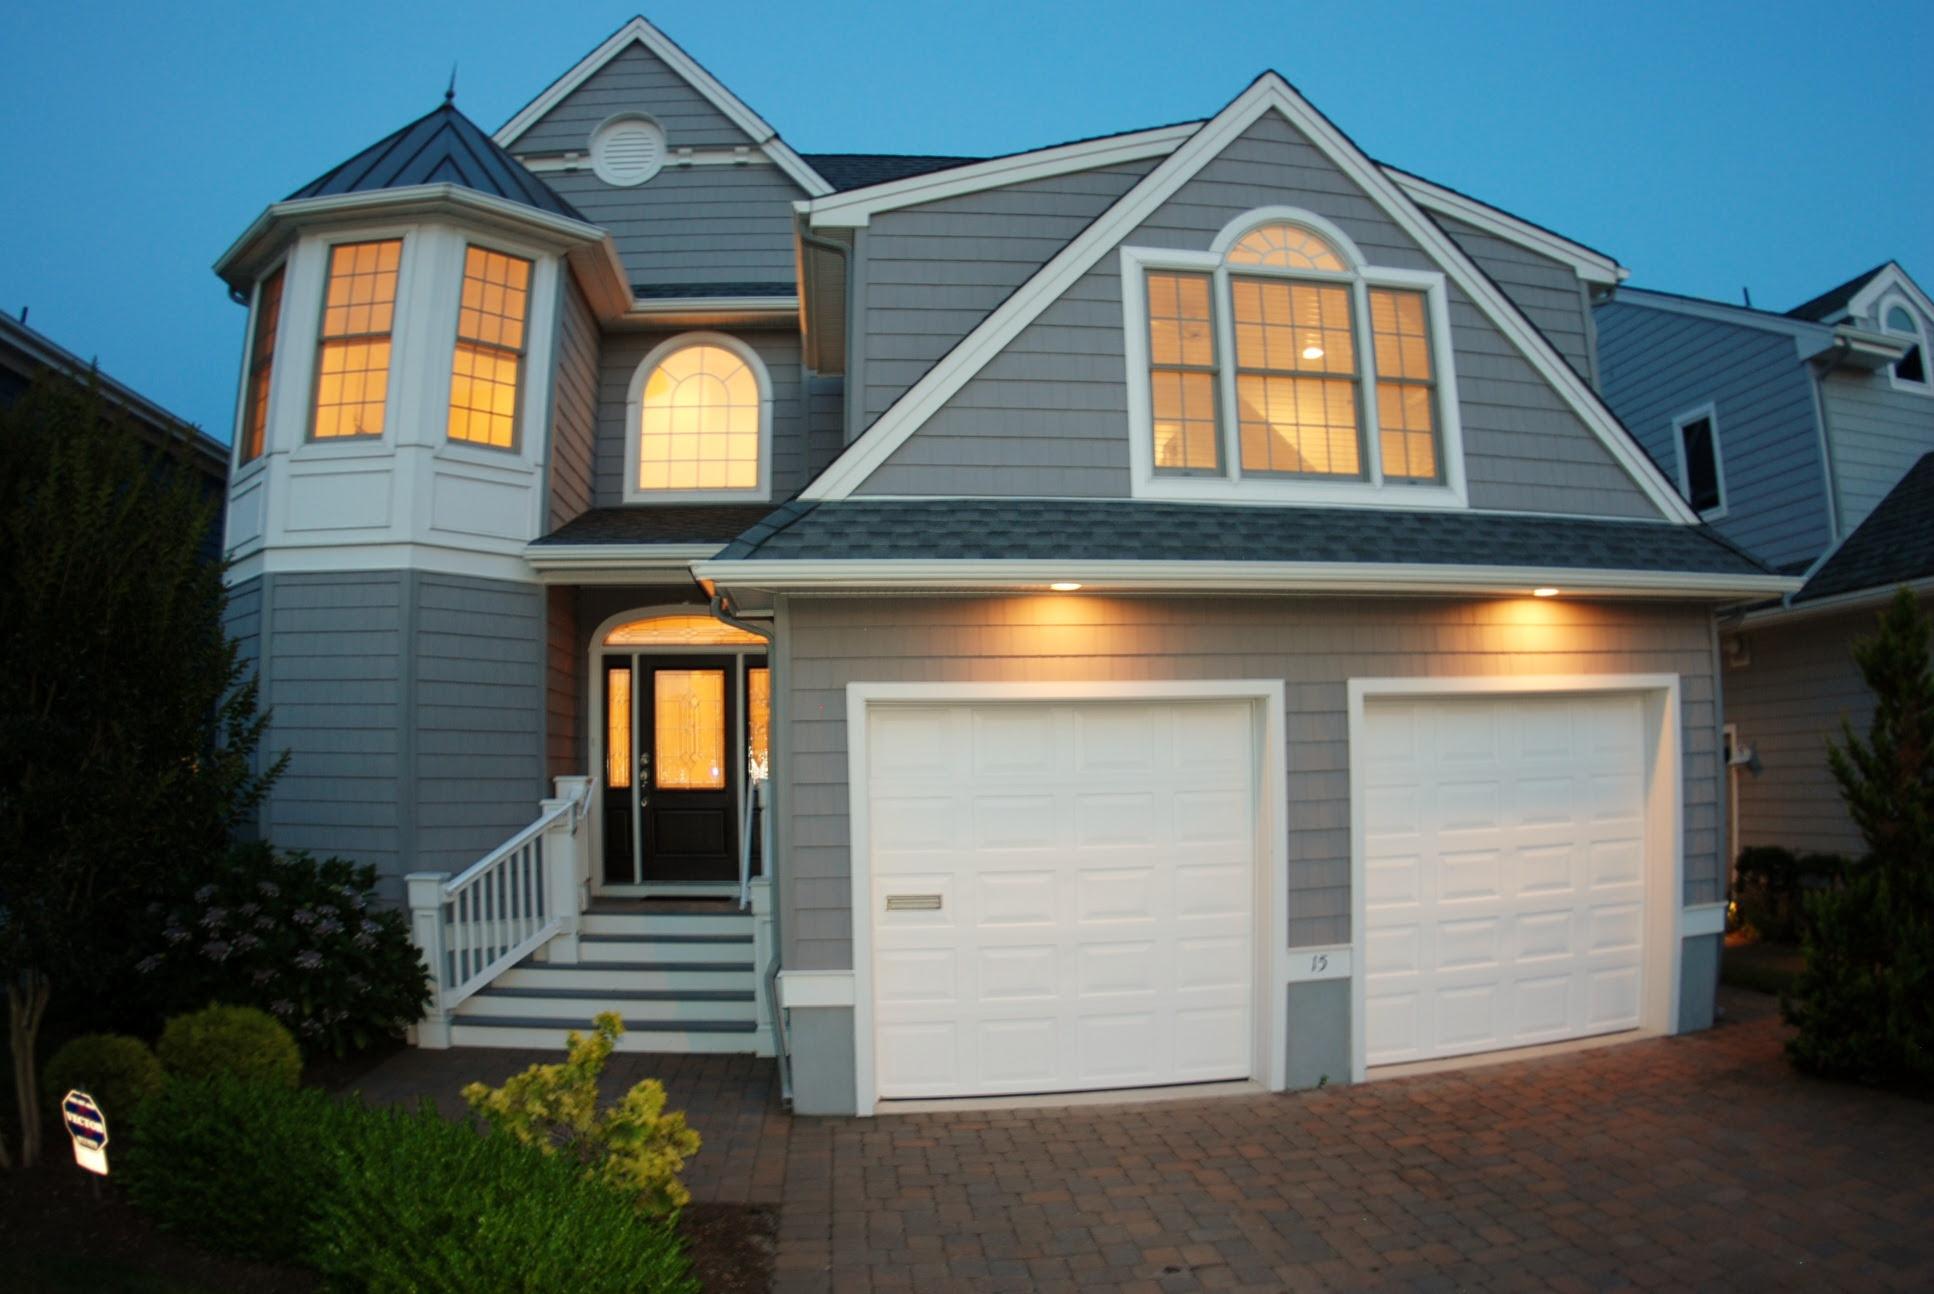 15 Gilbert Ln, Ocean City, NJ 08226  Home for Sale  Real Estate Listing